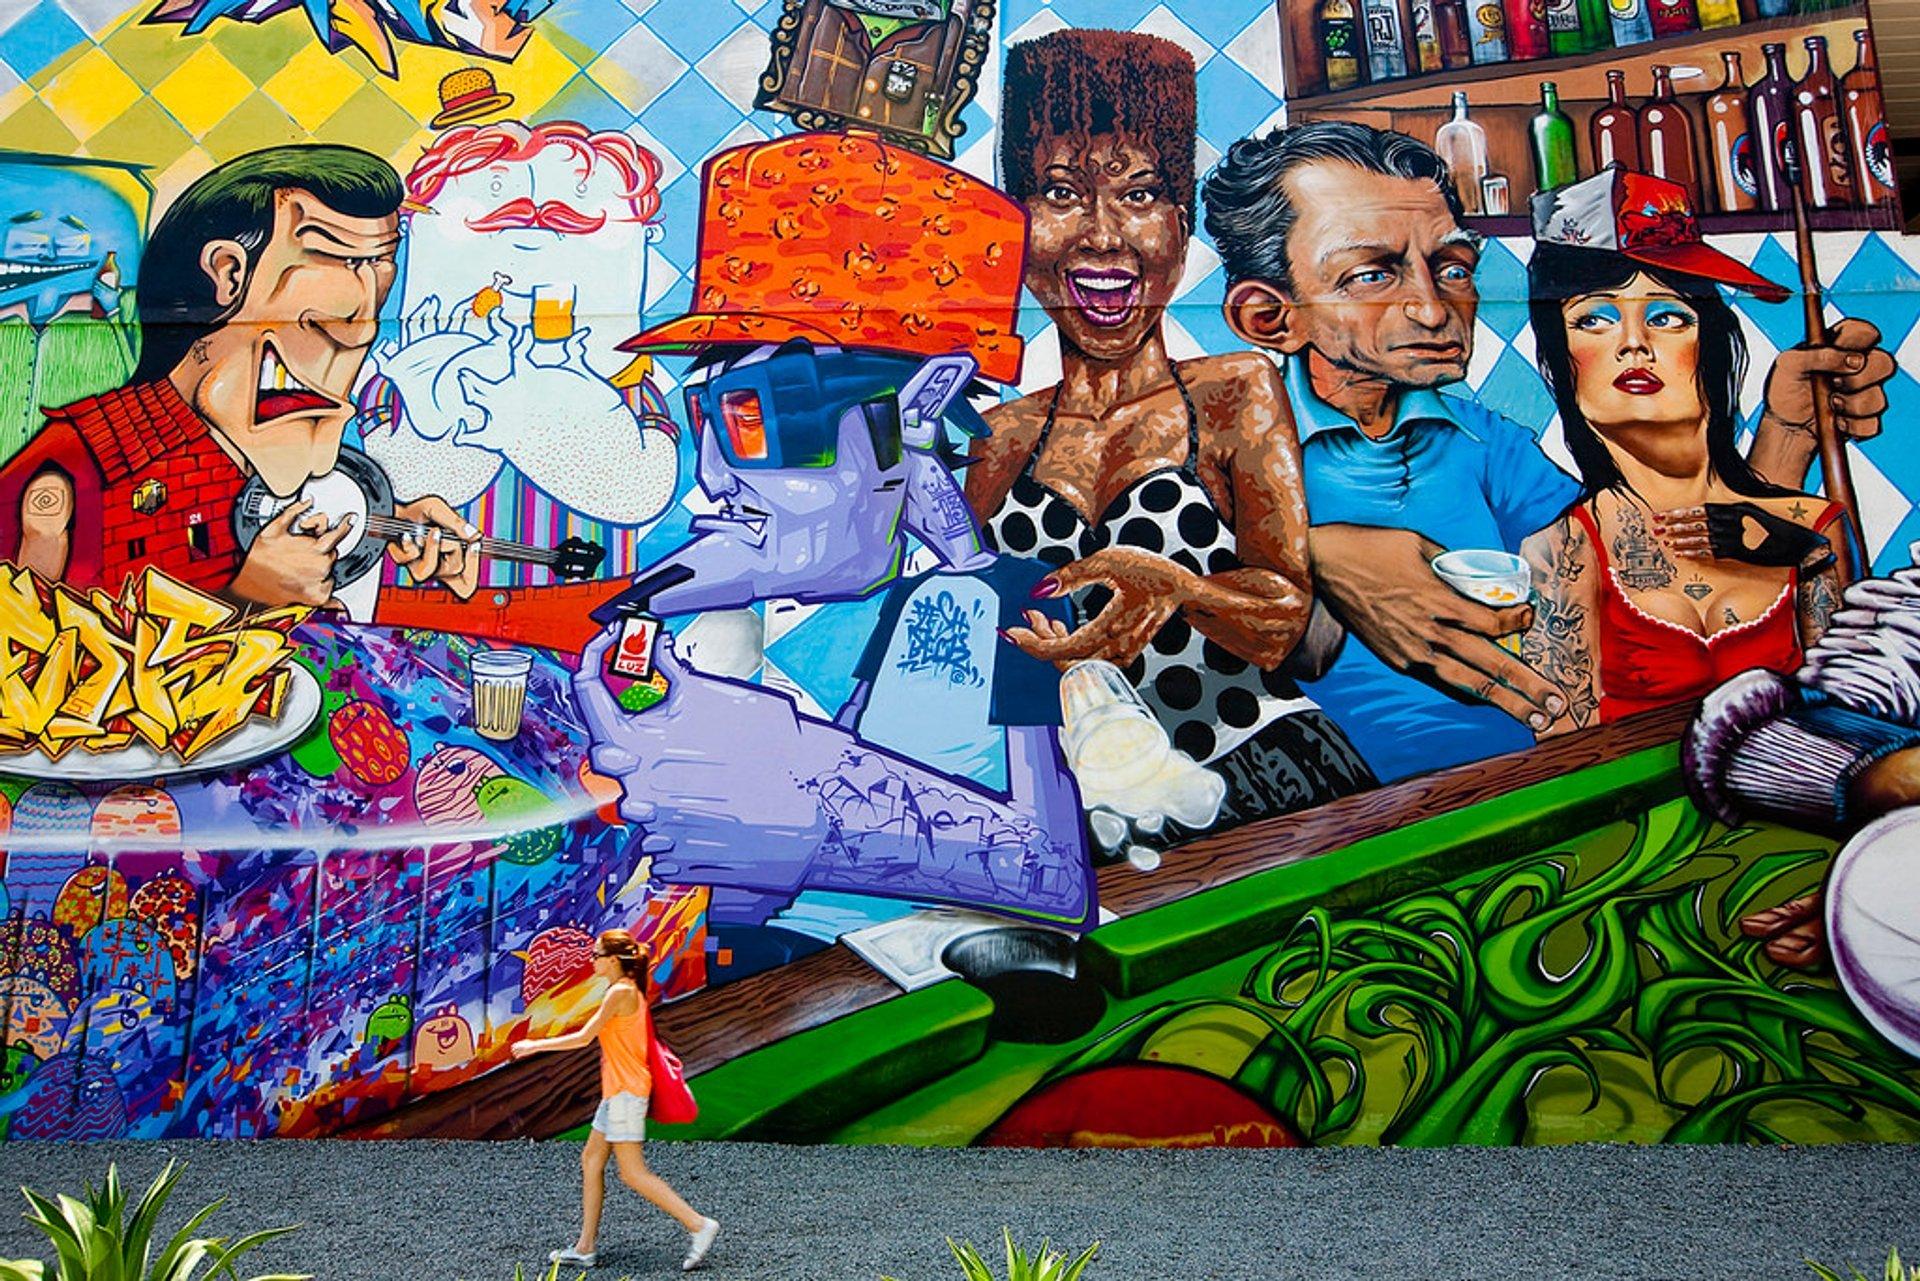 Lapa in Rio de Janeiro 2020 - Best Time